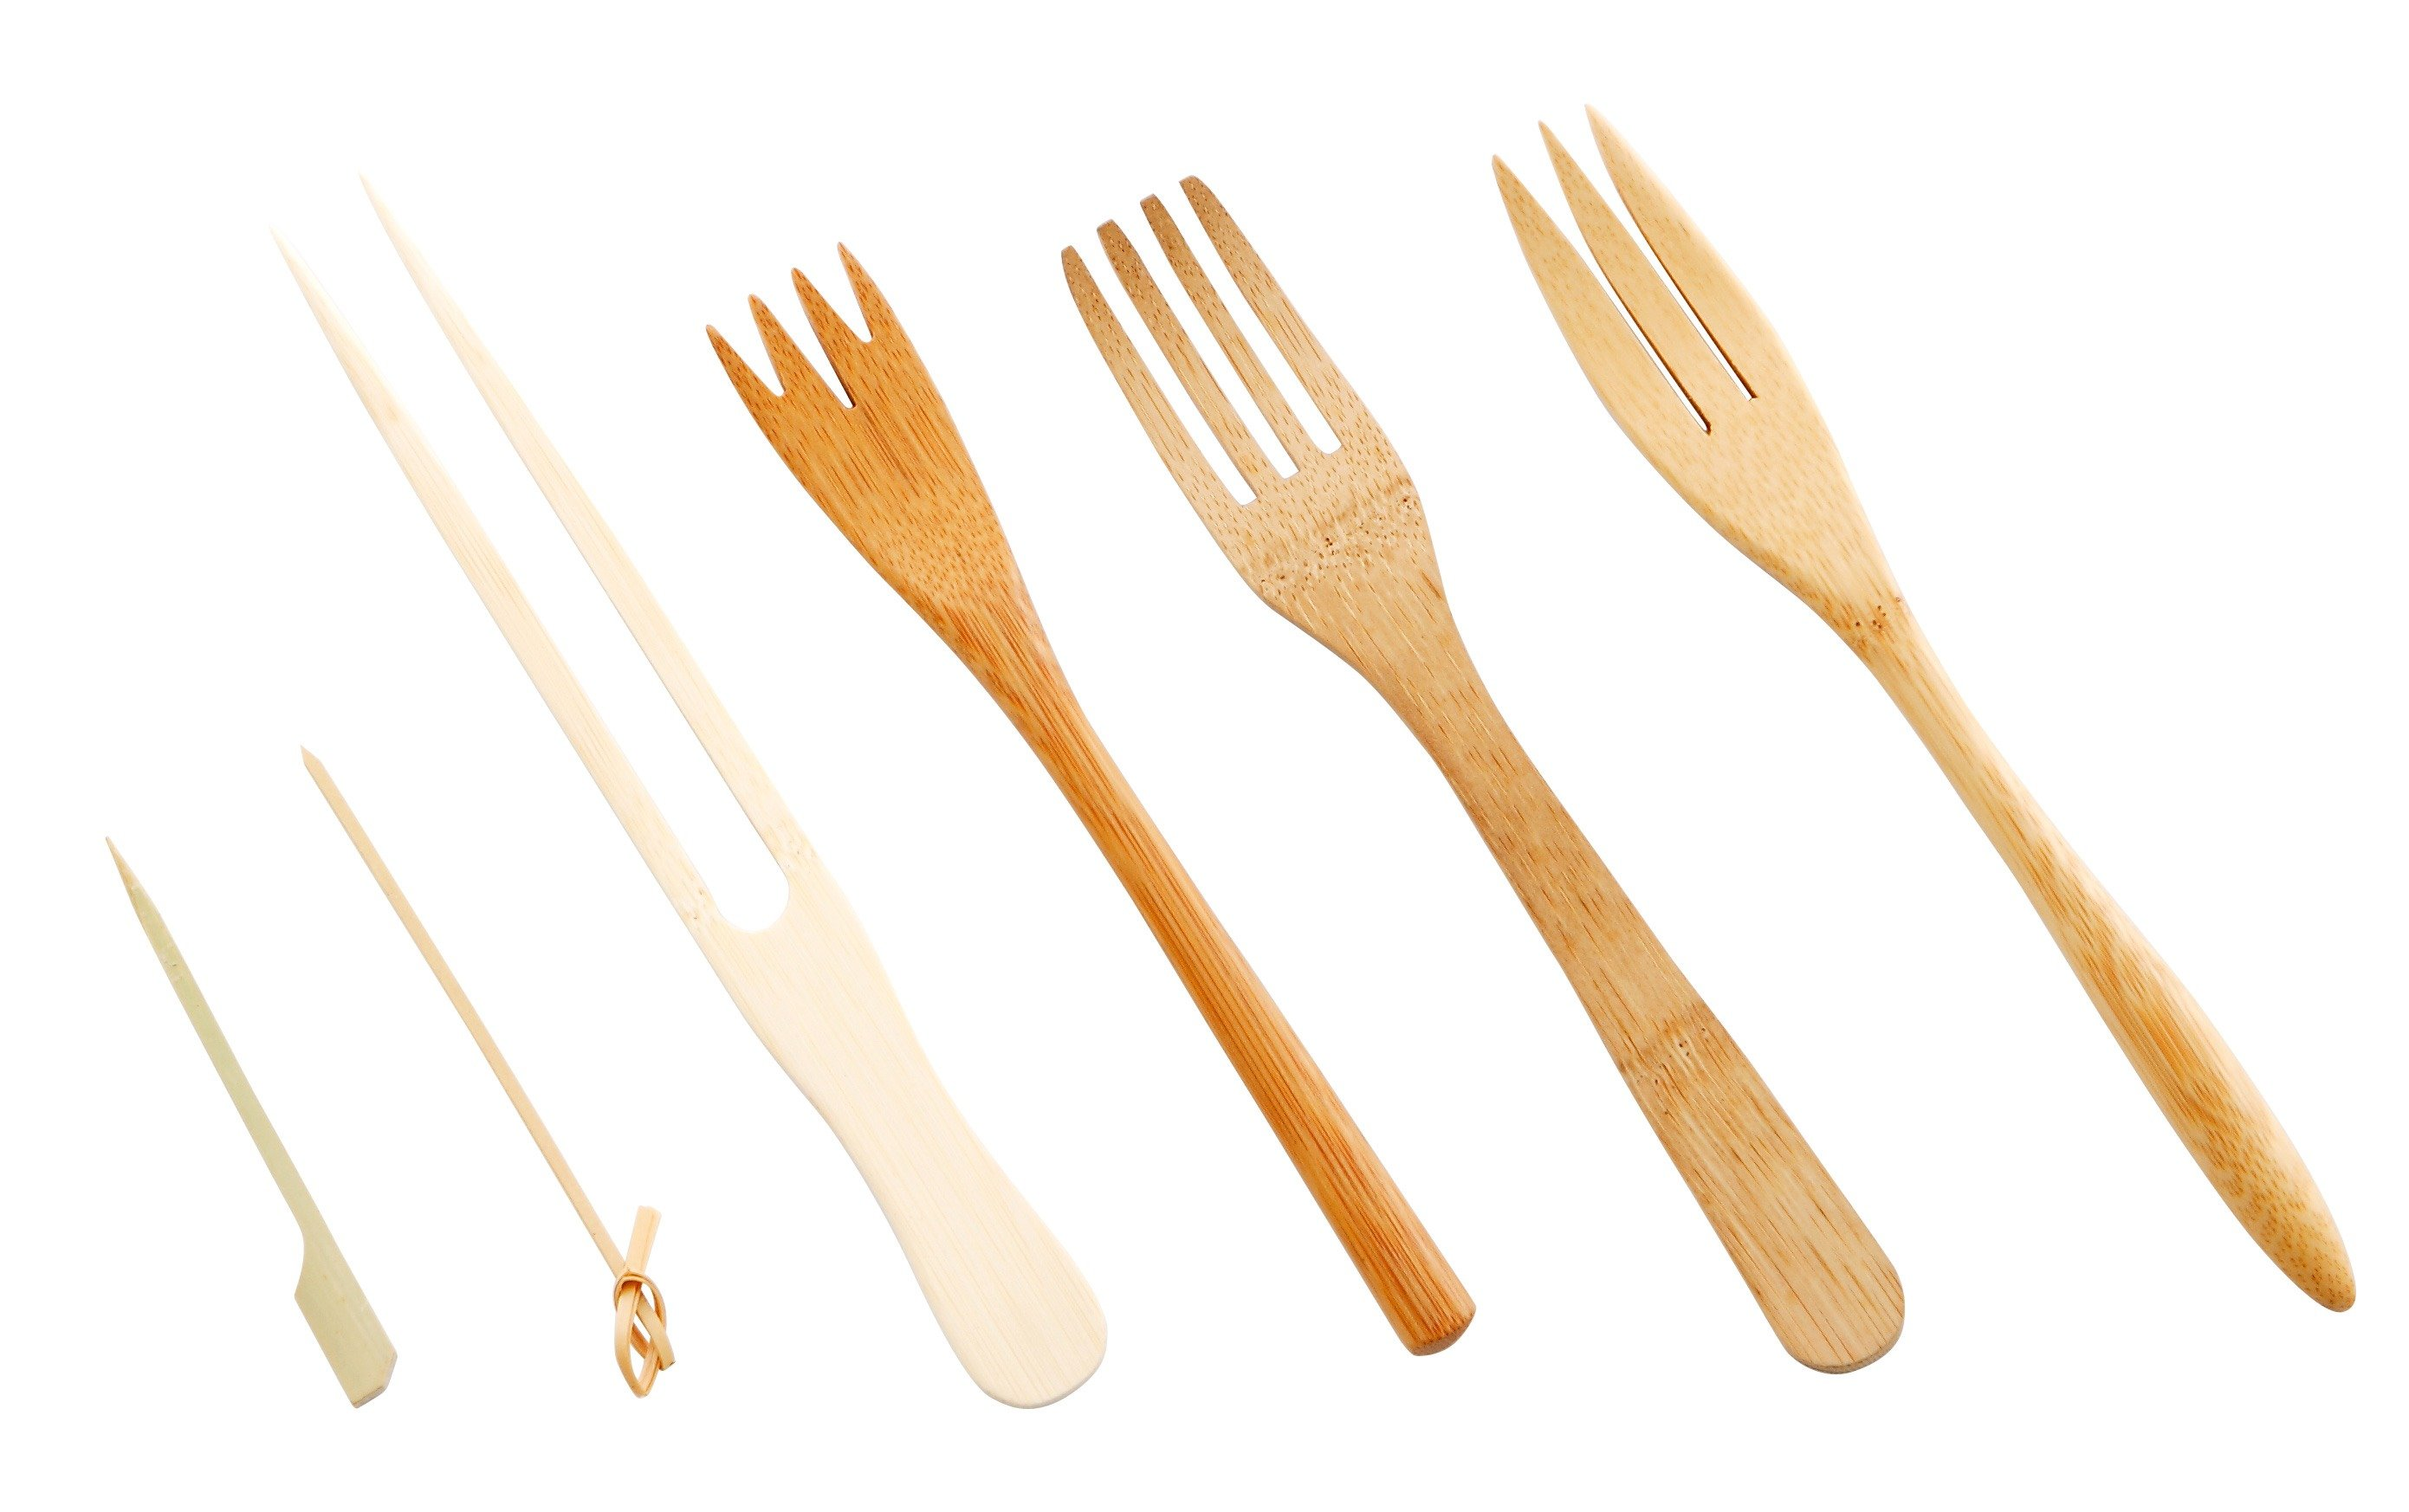 la-boos 竹製生活用品‧零汙染‧高品質 | 兒童餐具 | 廚房用具 | 生活用品 | 客製商品 |::竹的百科::碳化竹子